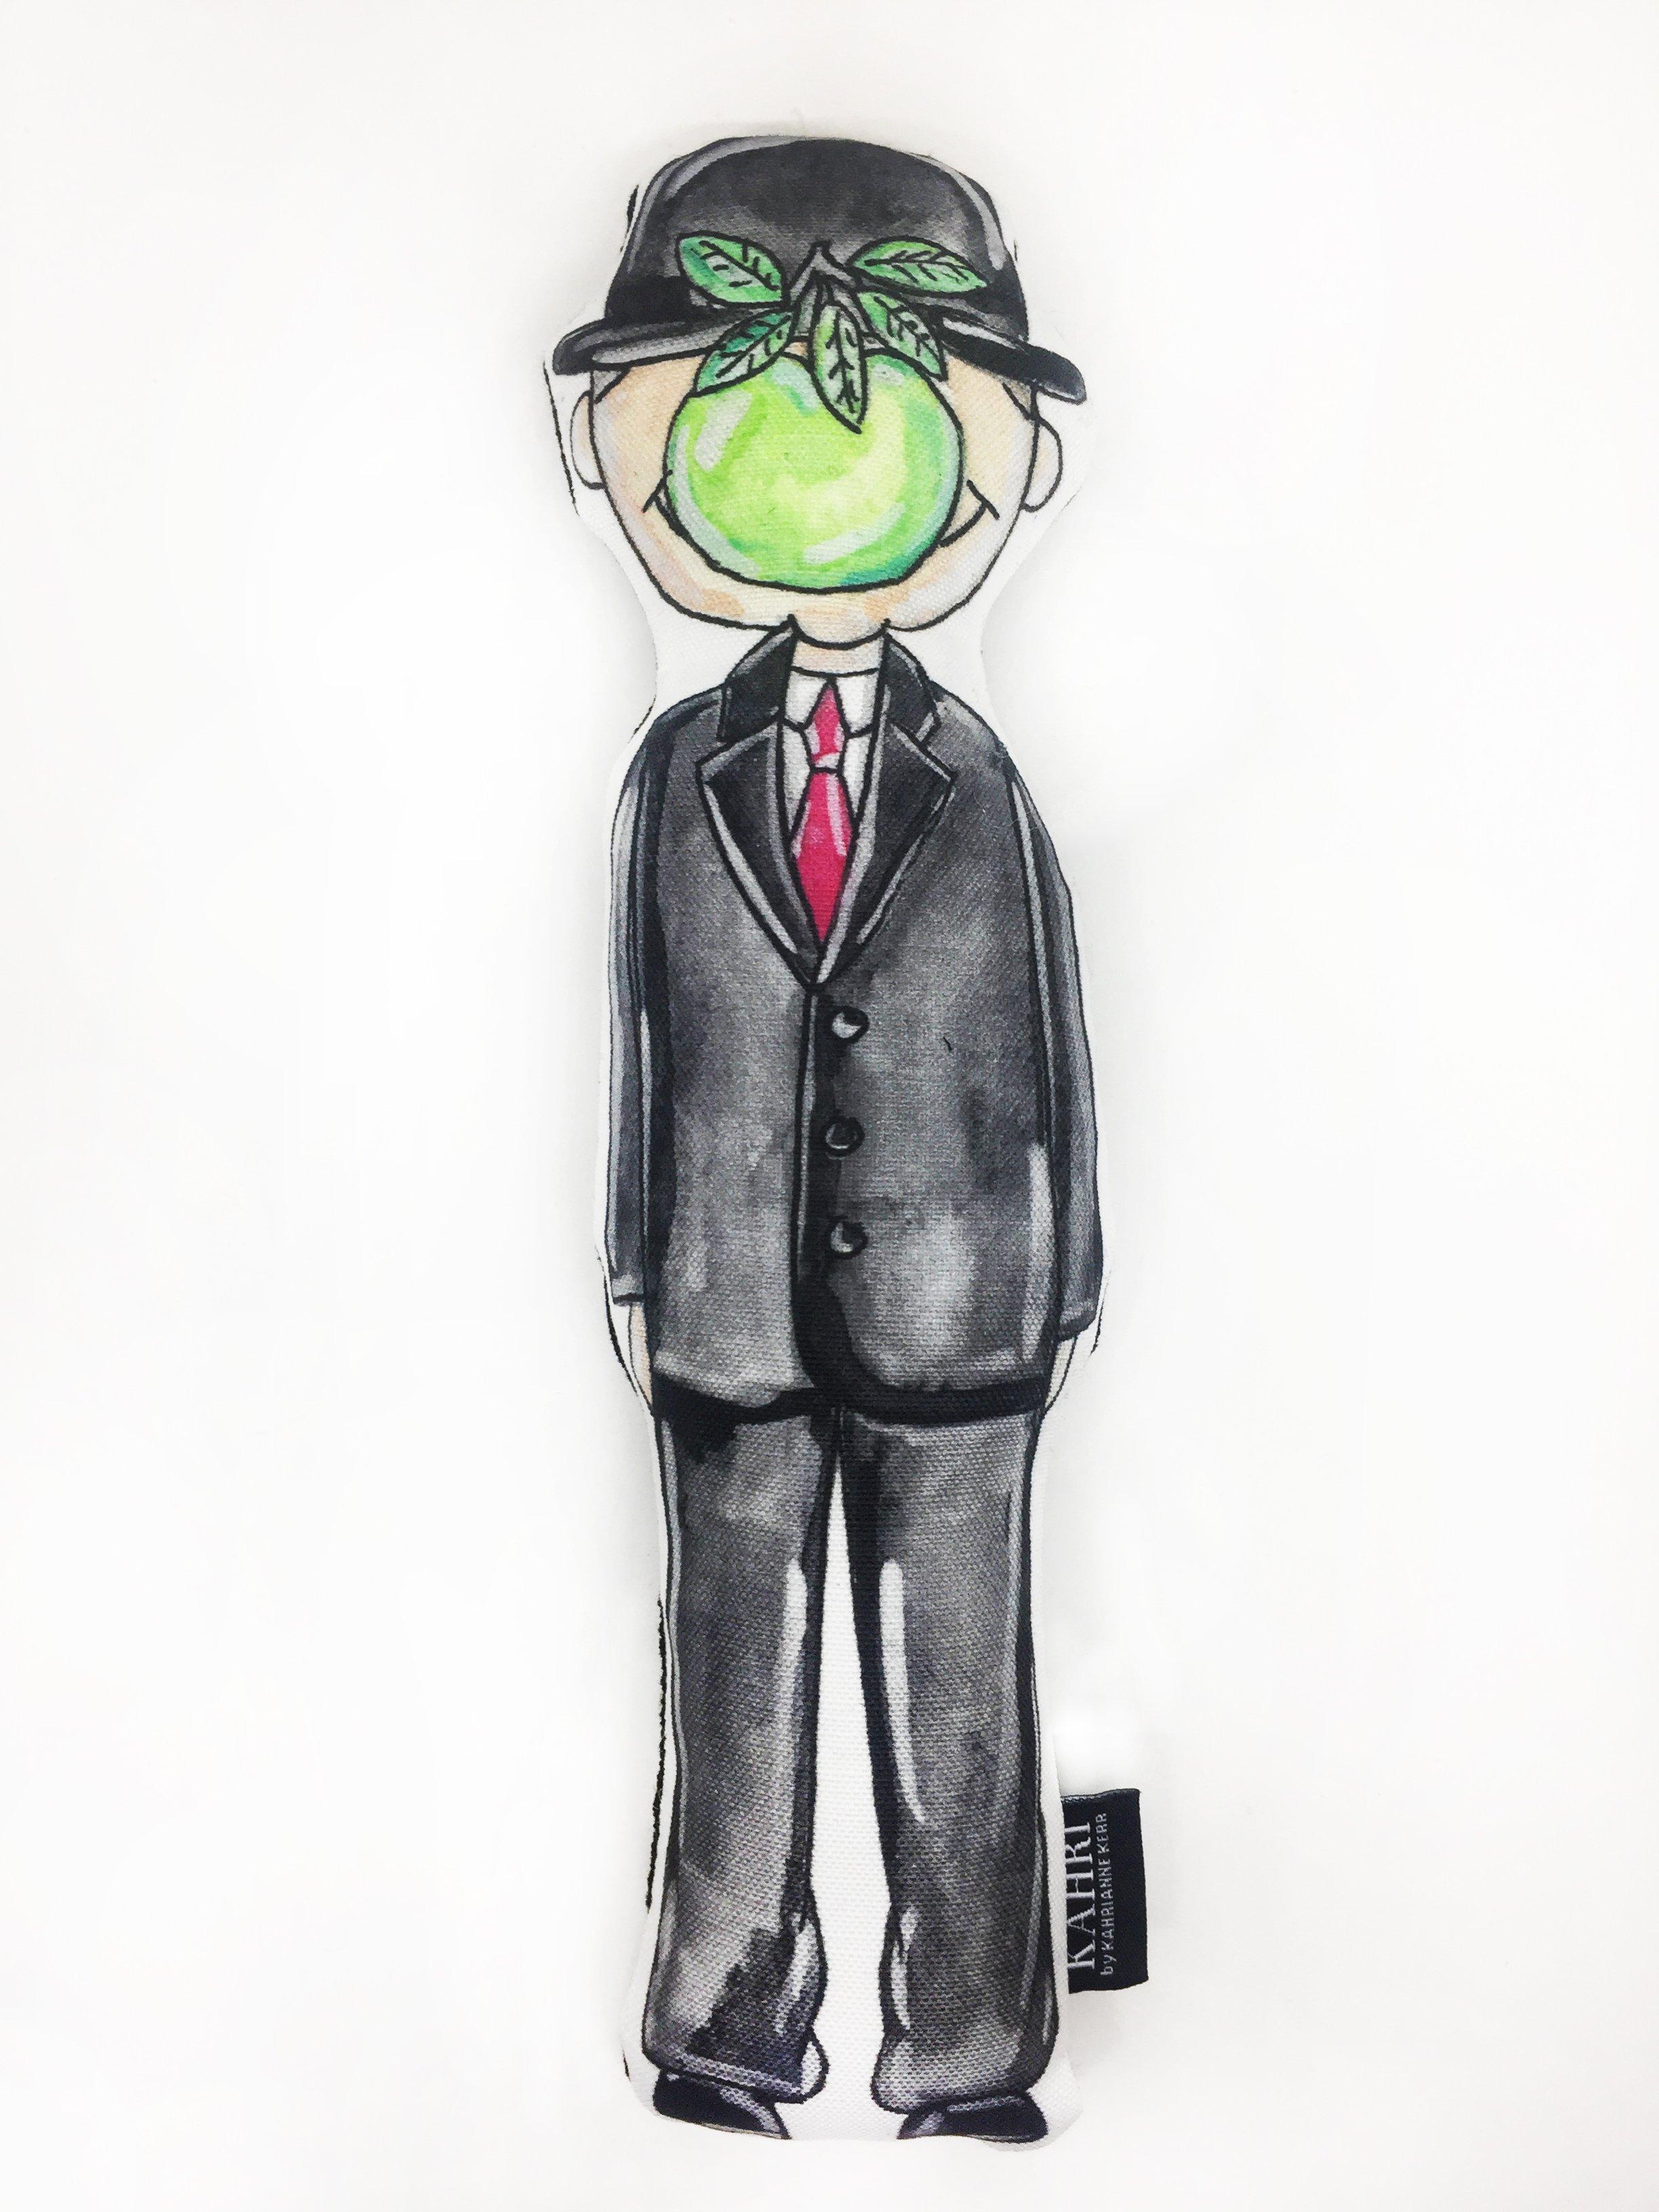 Little Magritte Doll